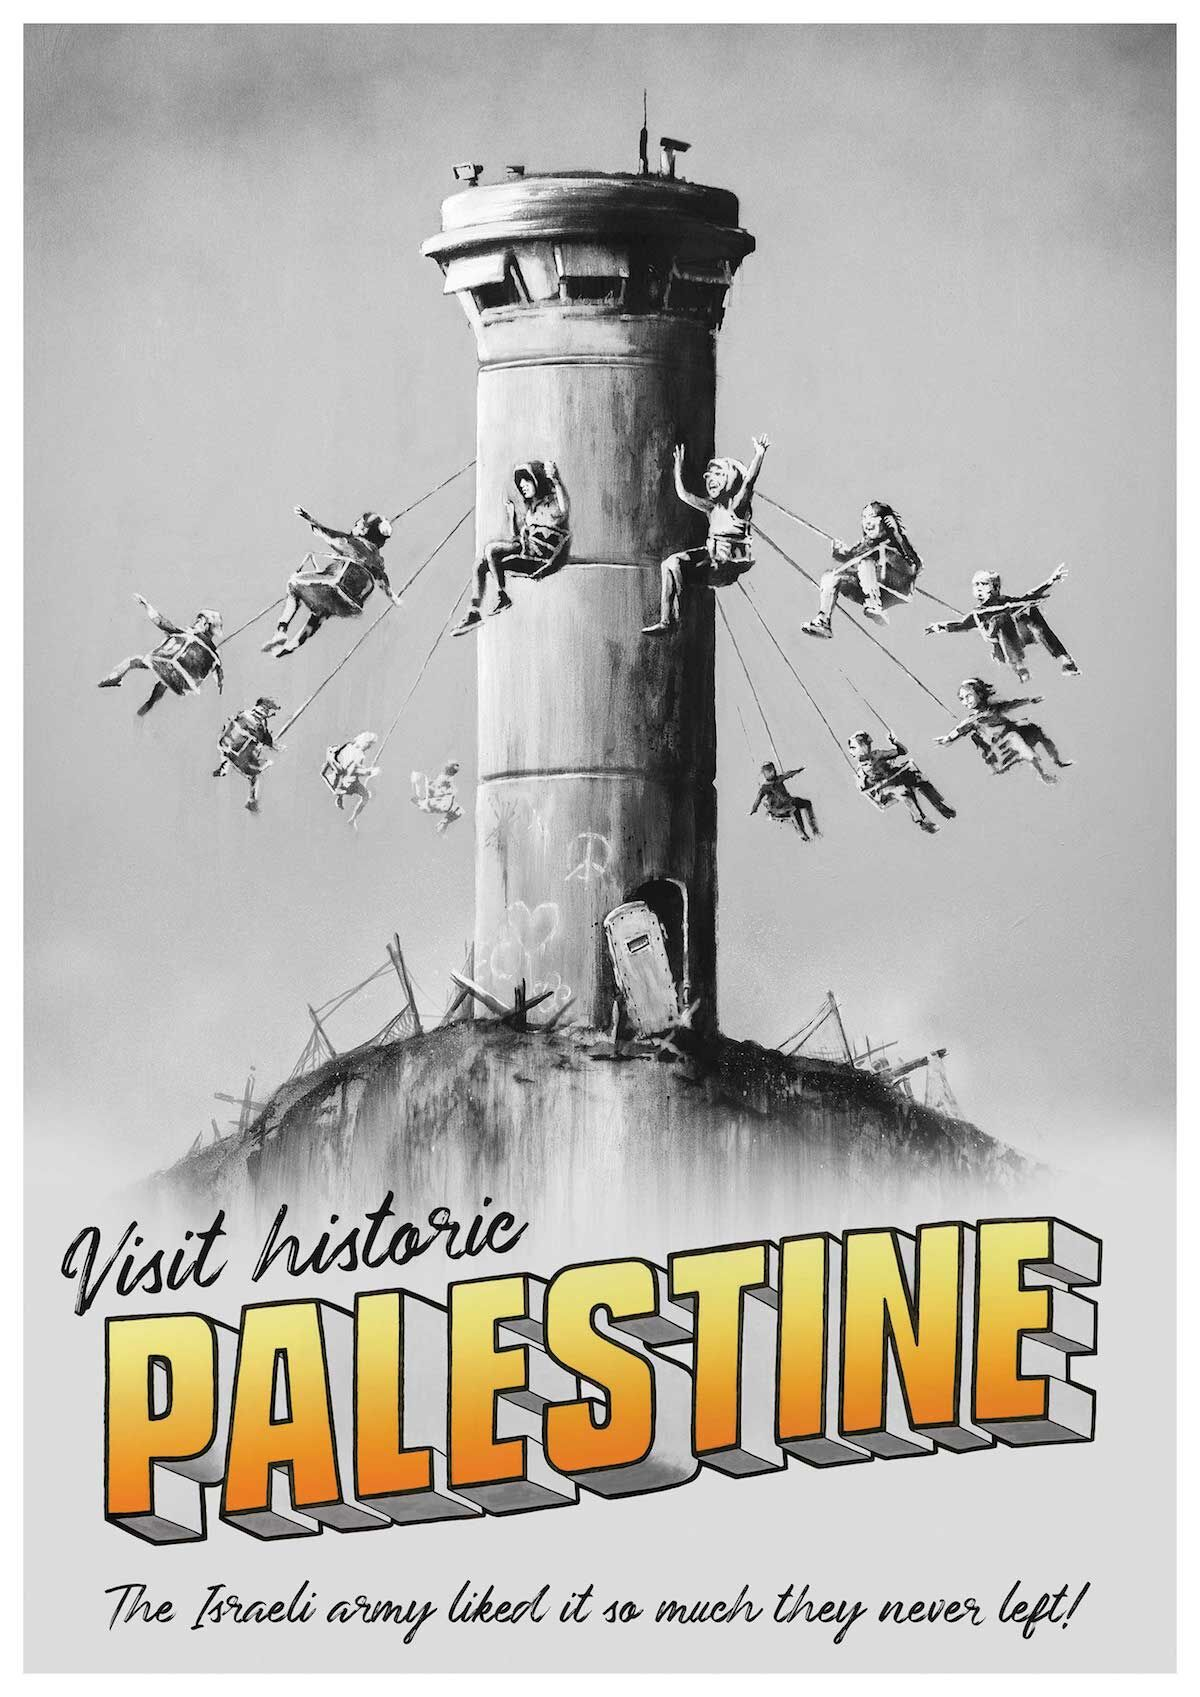 Palestine poster by Banksy. Courtesy the artist, via banksy.co.uk.